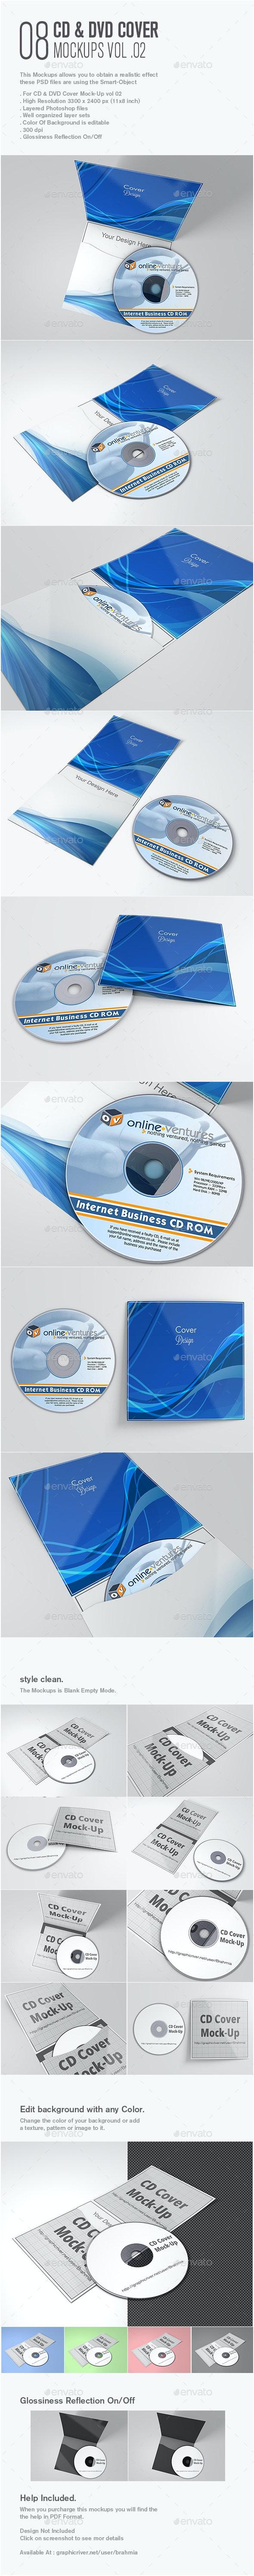 CD & DVD Cover Mock-Up vol 02 - Stationery Print